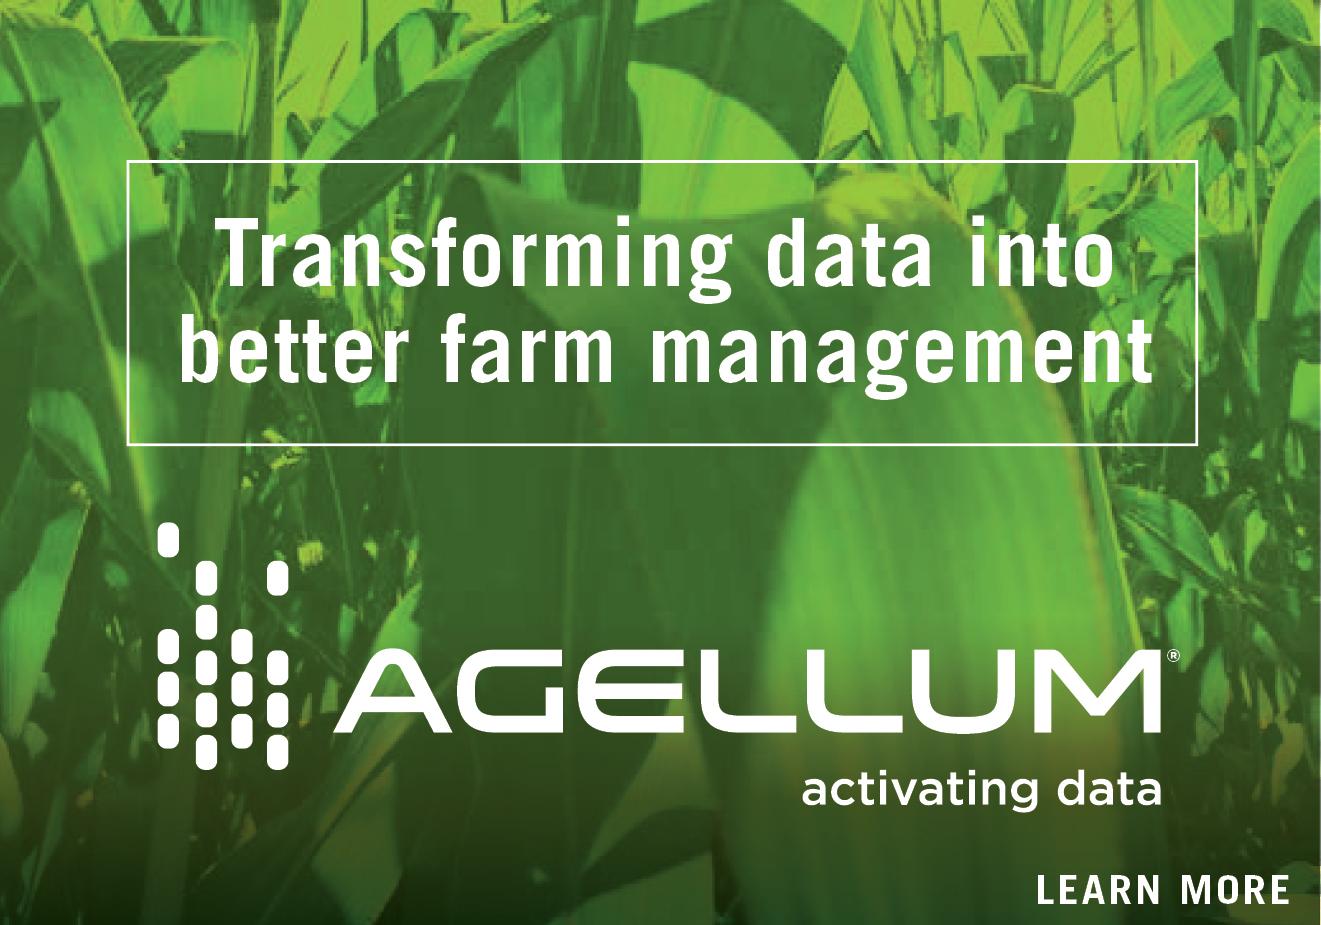 Agellum: Transforming data into better farm management